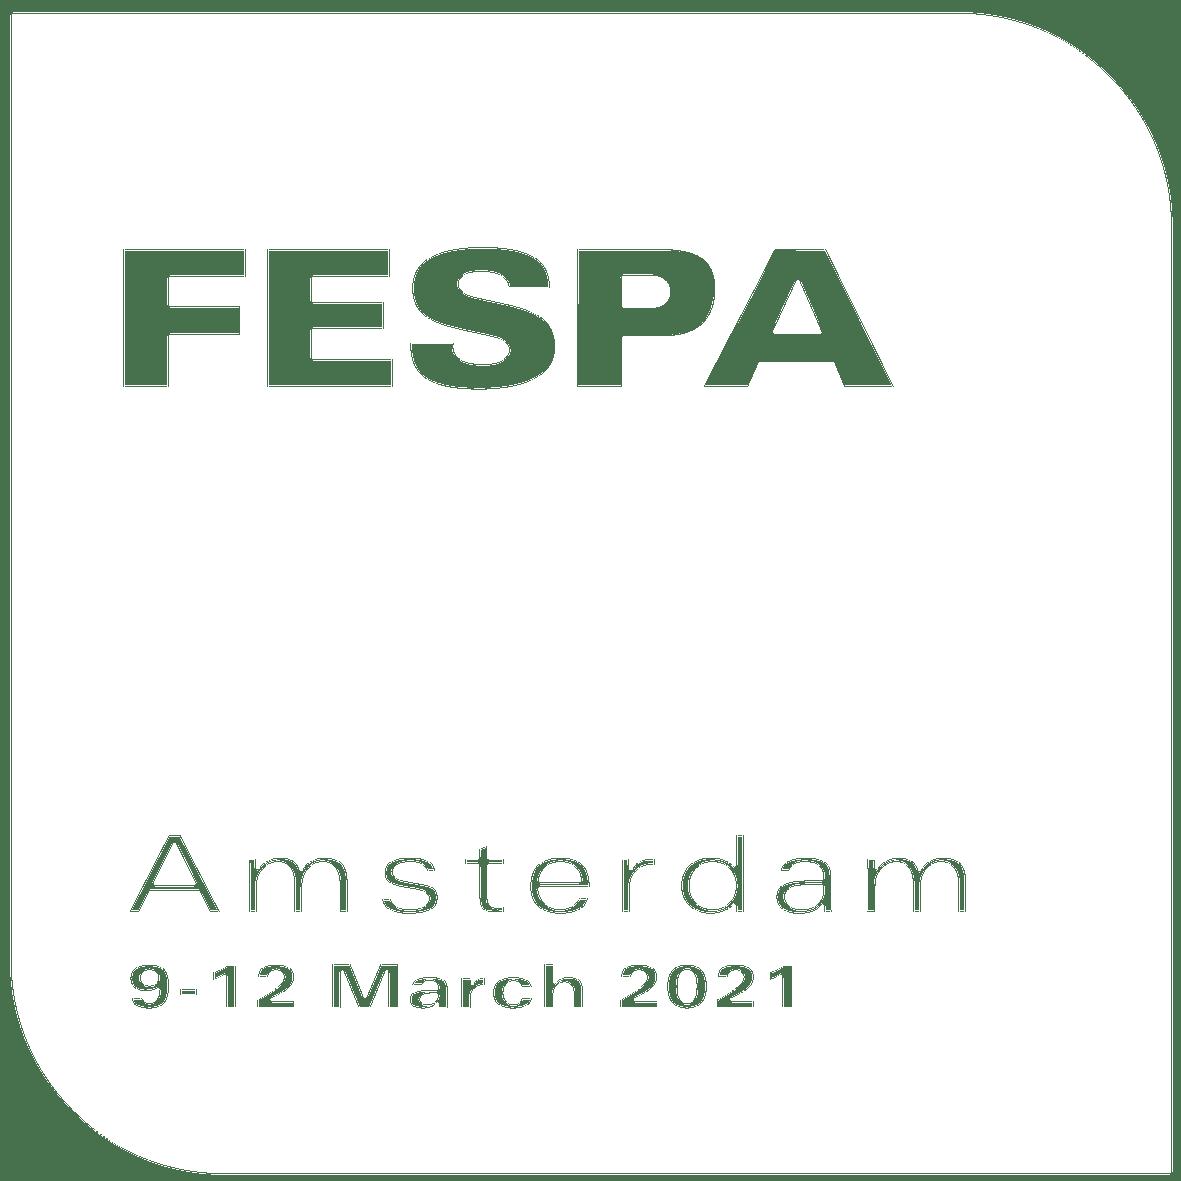 FESPA